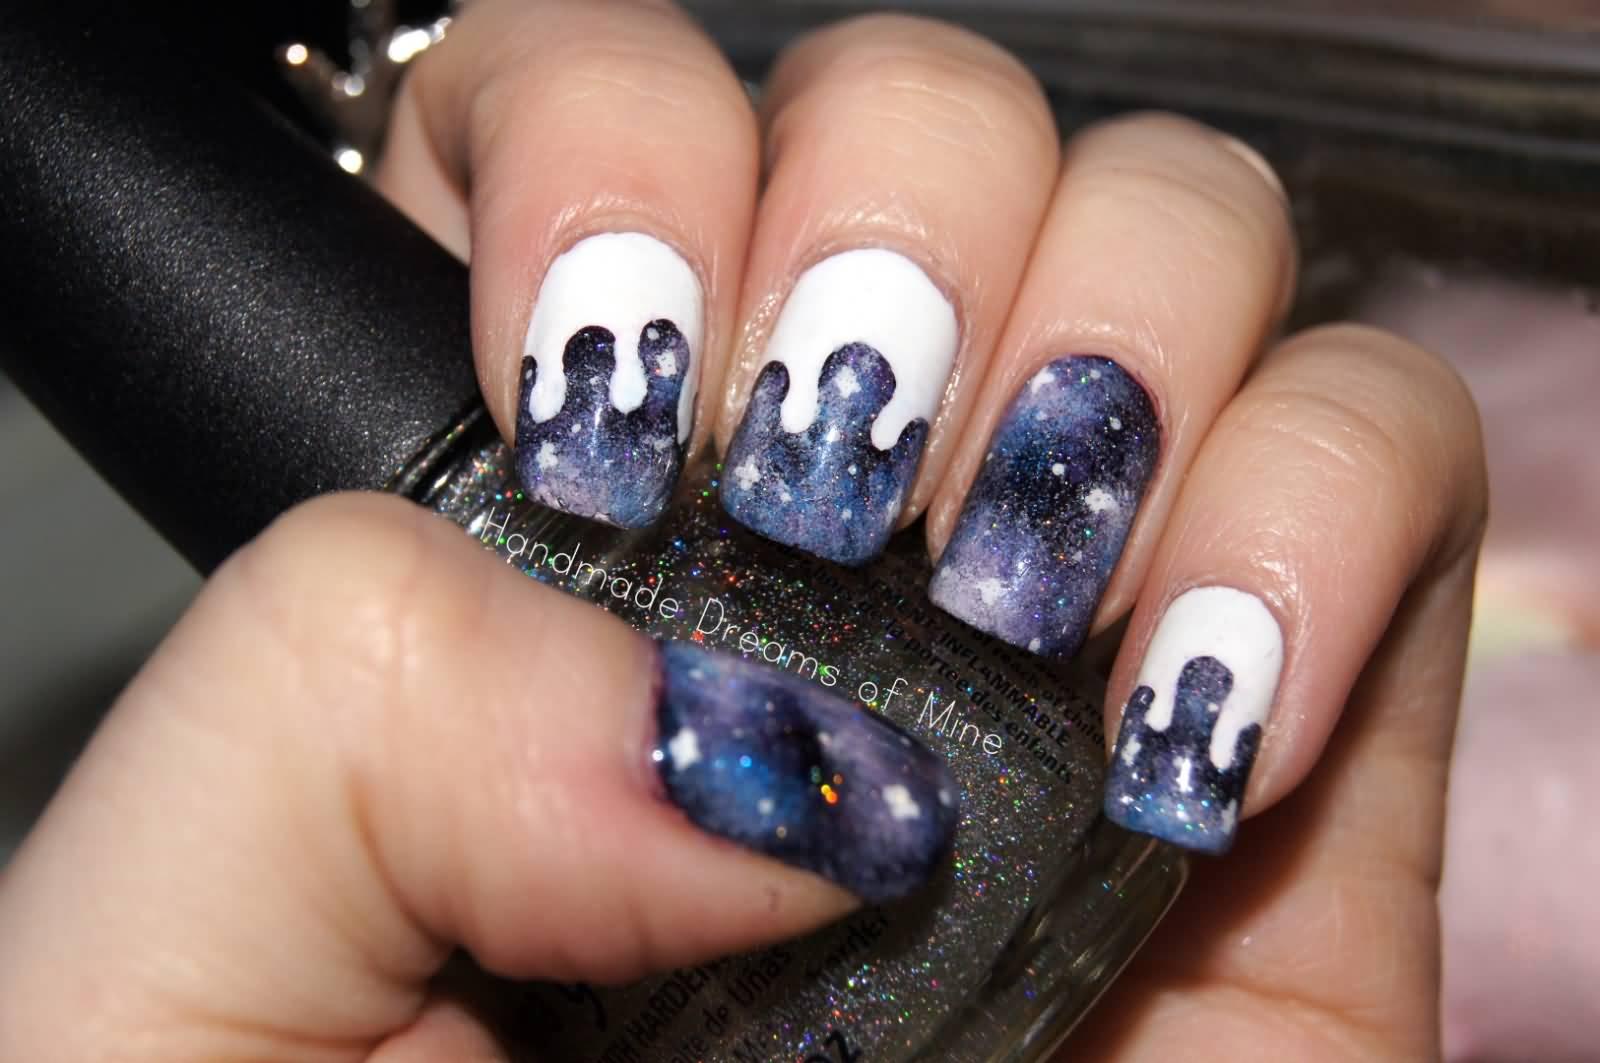 Amazing Galaxy Nail Art Tips Sketch - Nail Art Ideas - morihati.com